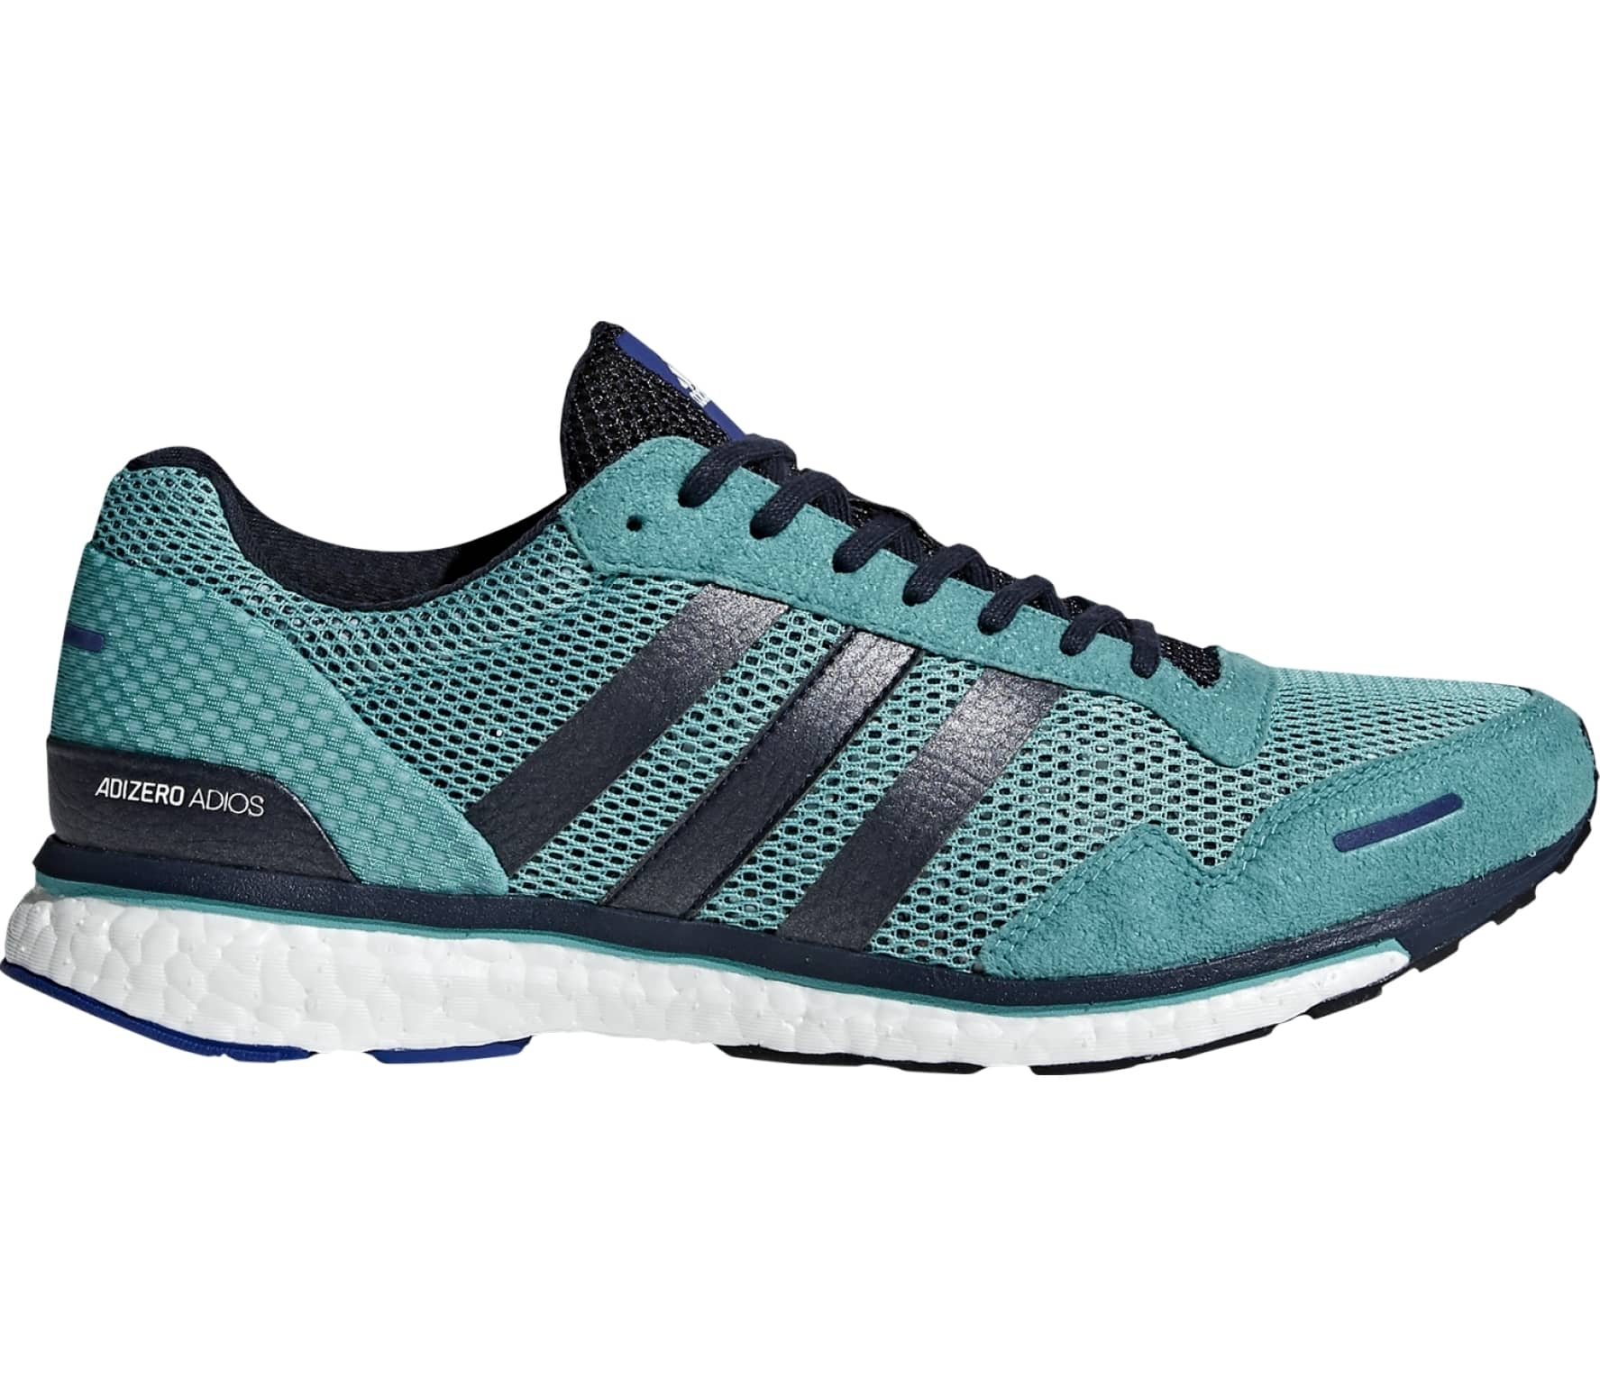 online retailer 4aacc 8028b Adidas - adizero adios 3 Heren ren schoen (t+E2E36urkooiszwart ...